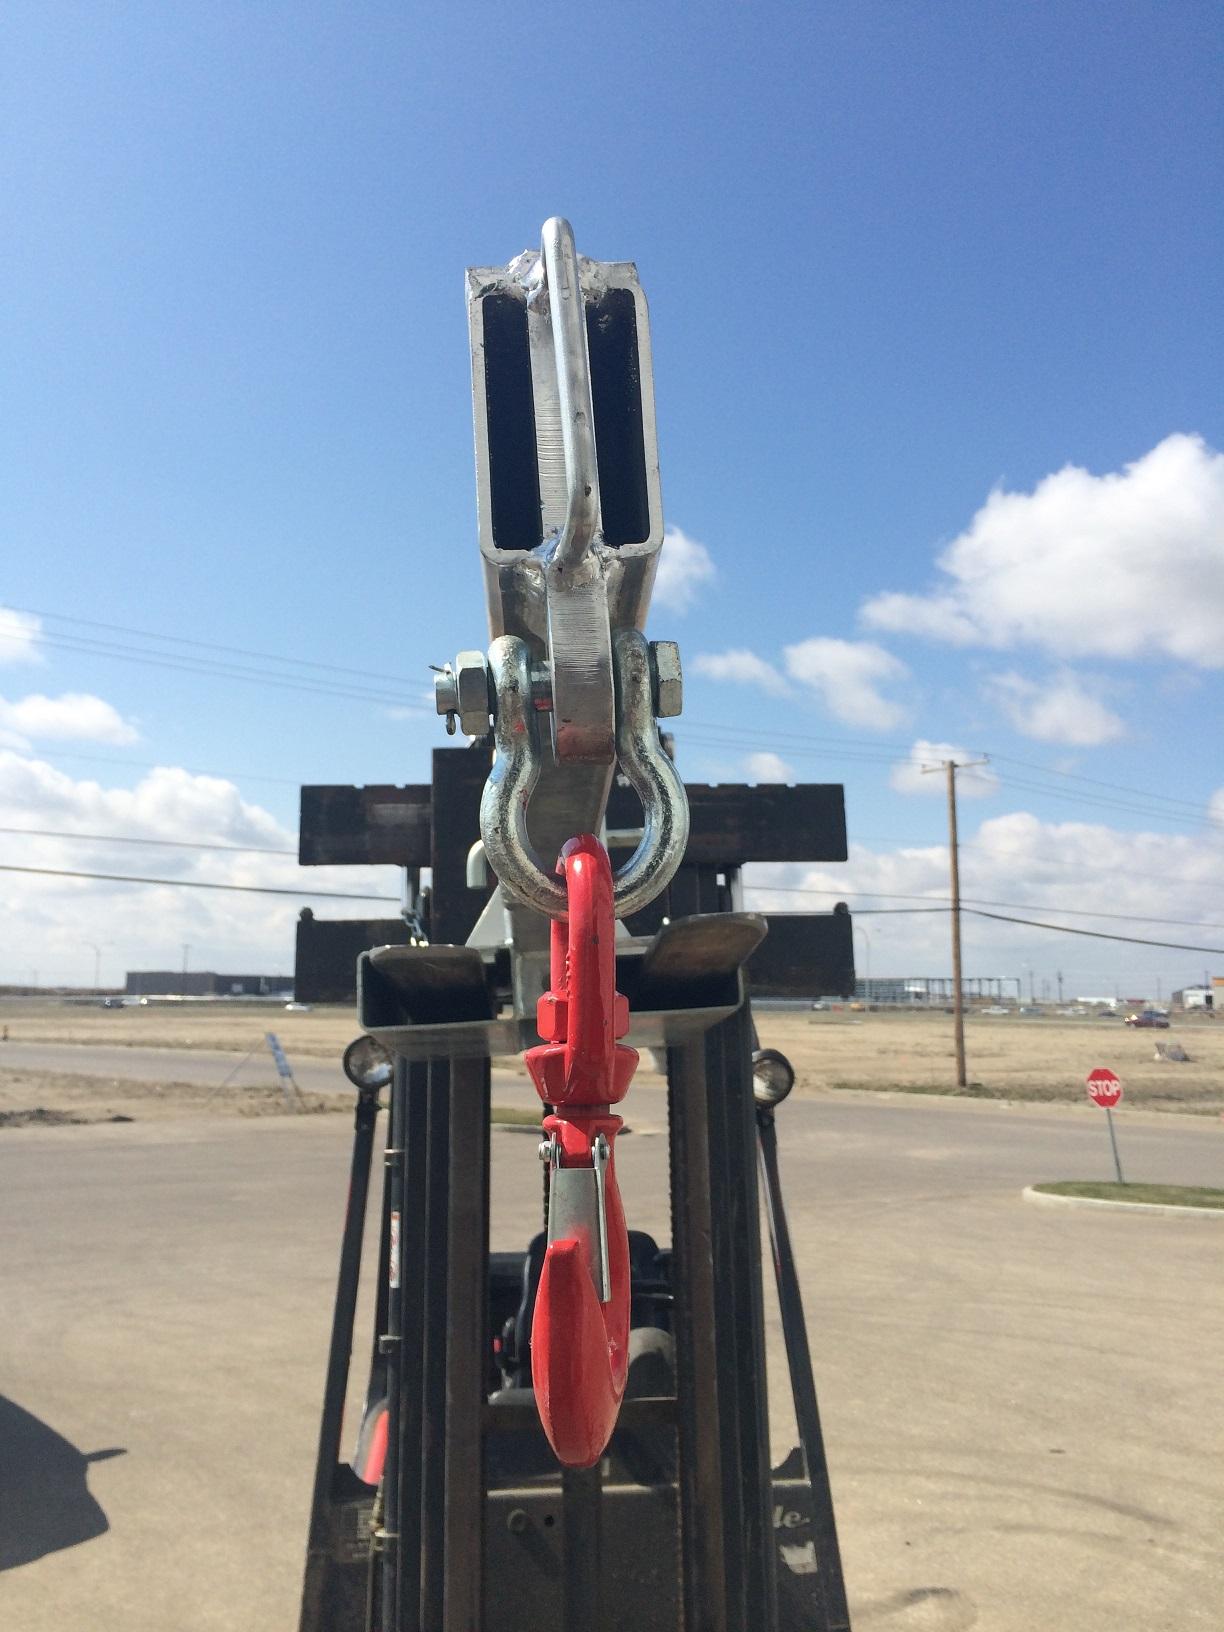 New Forklift Amp Steer Extension Jib Fjcs Uncle Wiener Wholesale